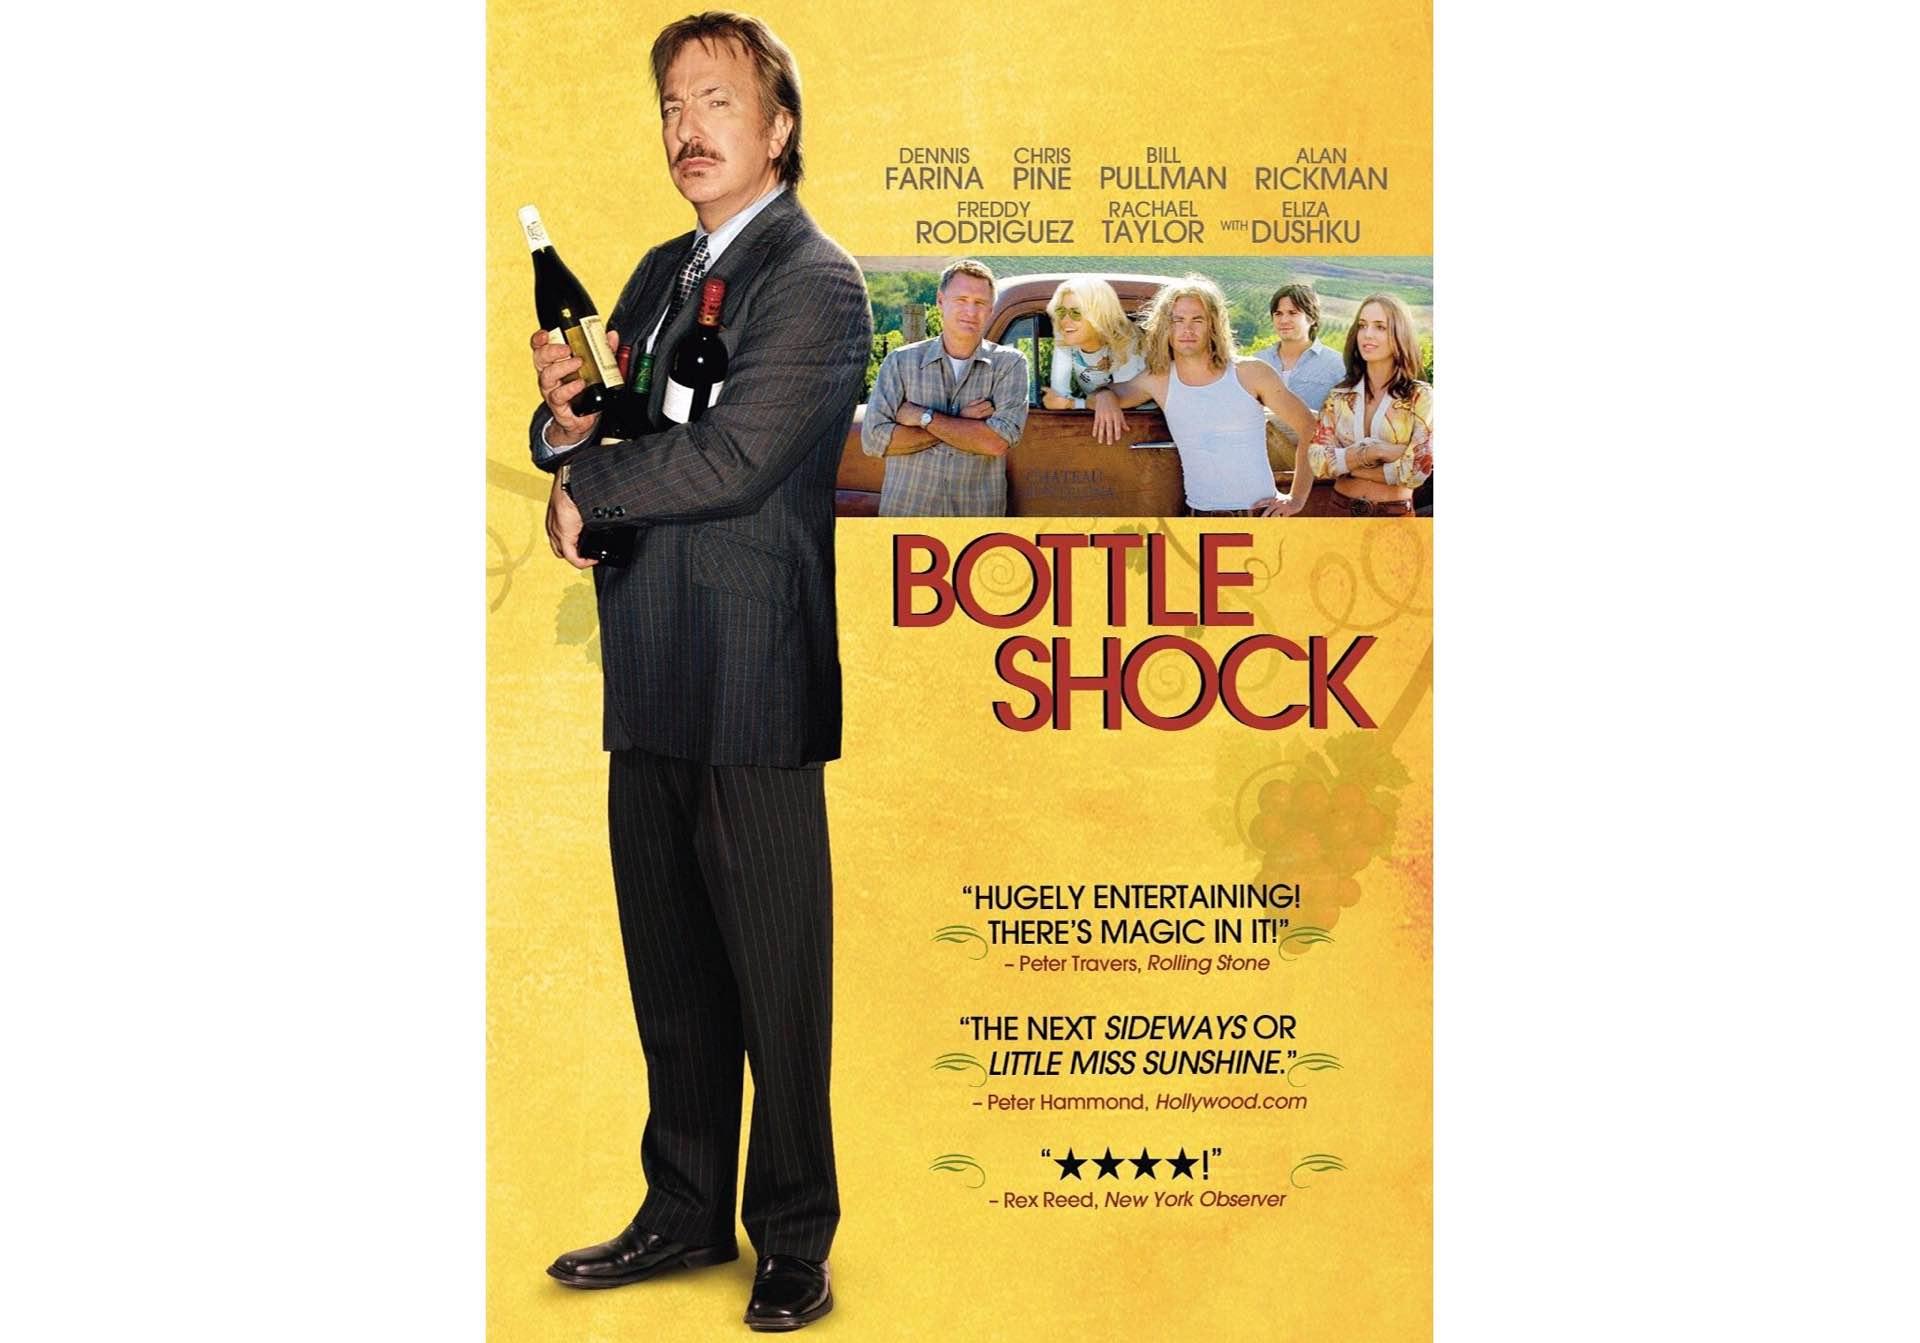 bottle-shock-film